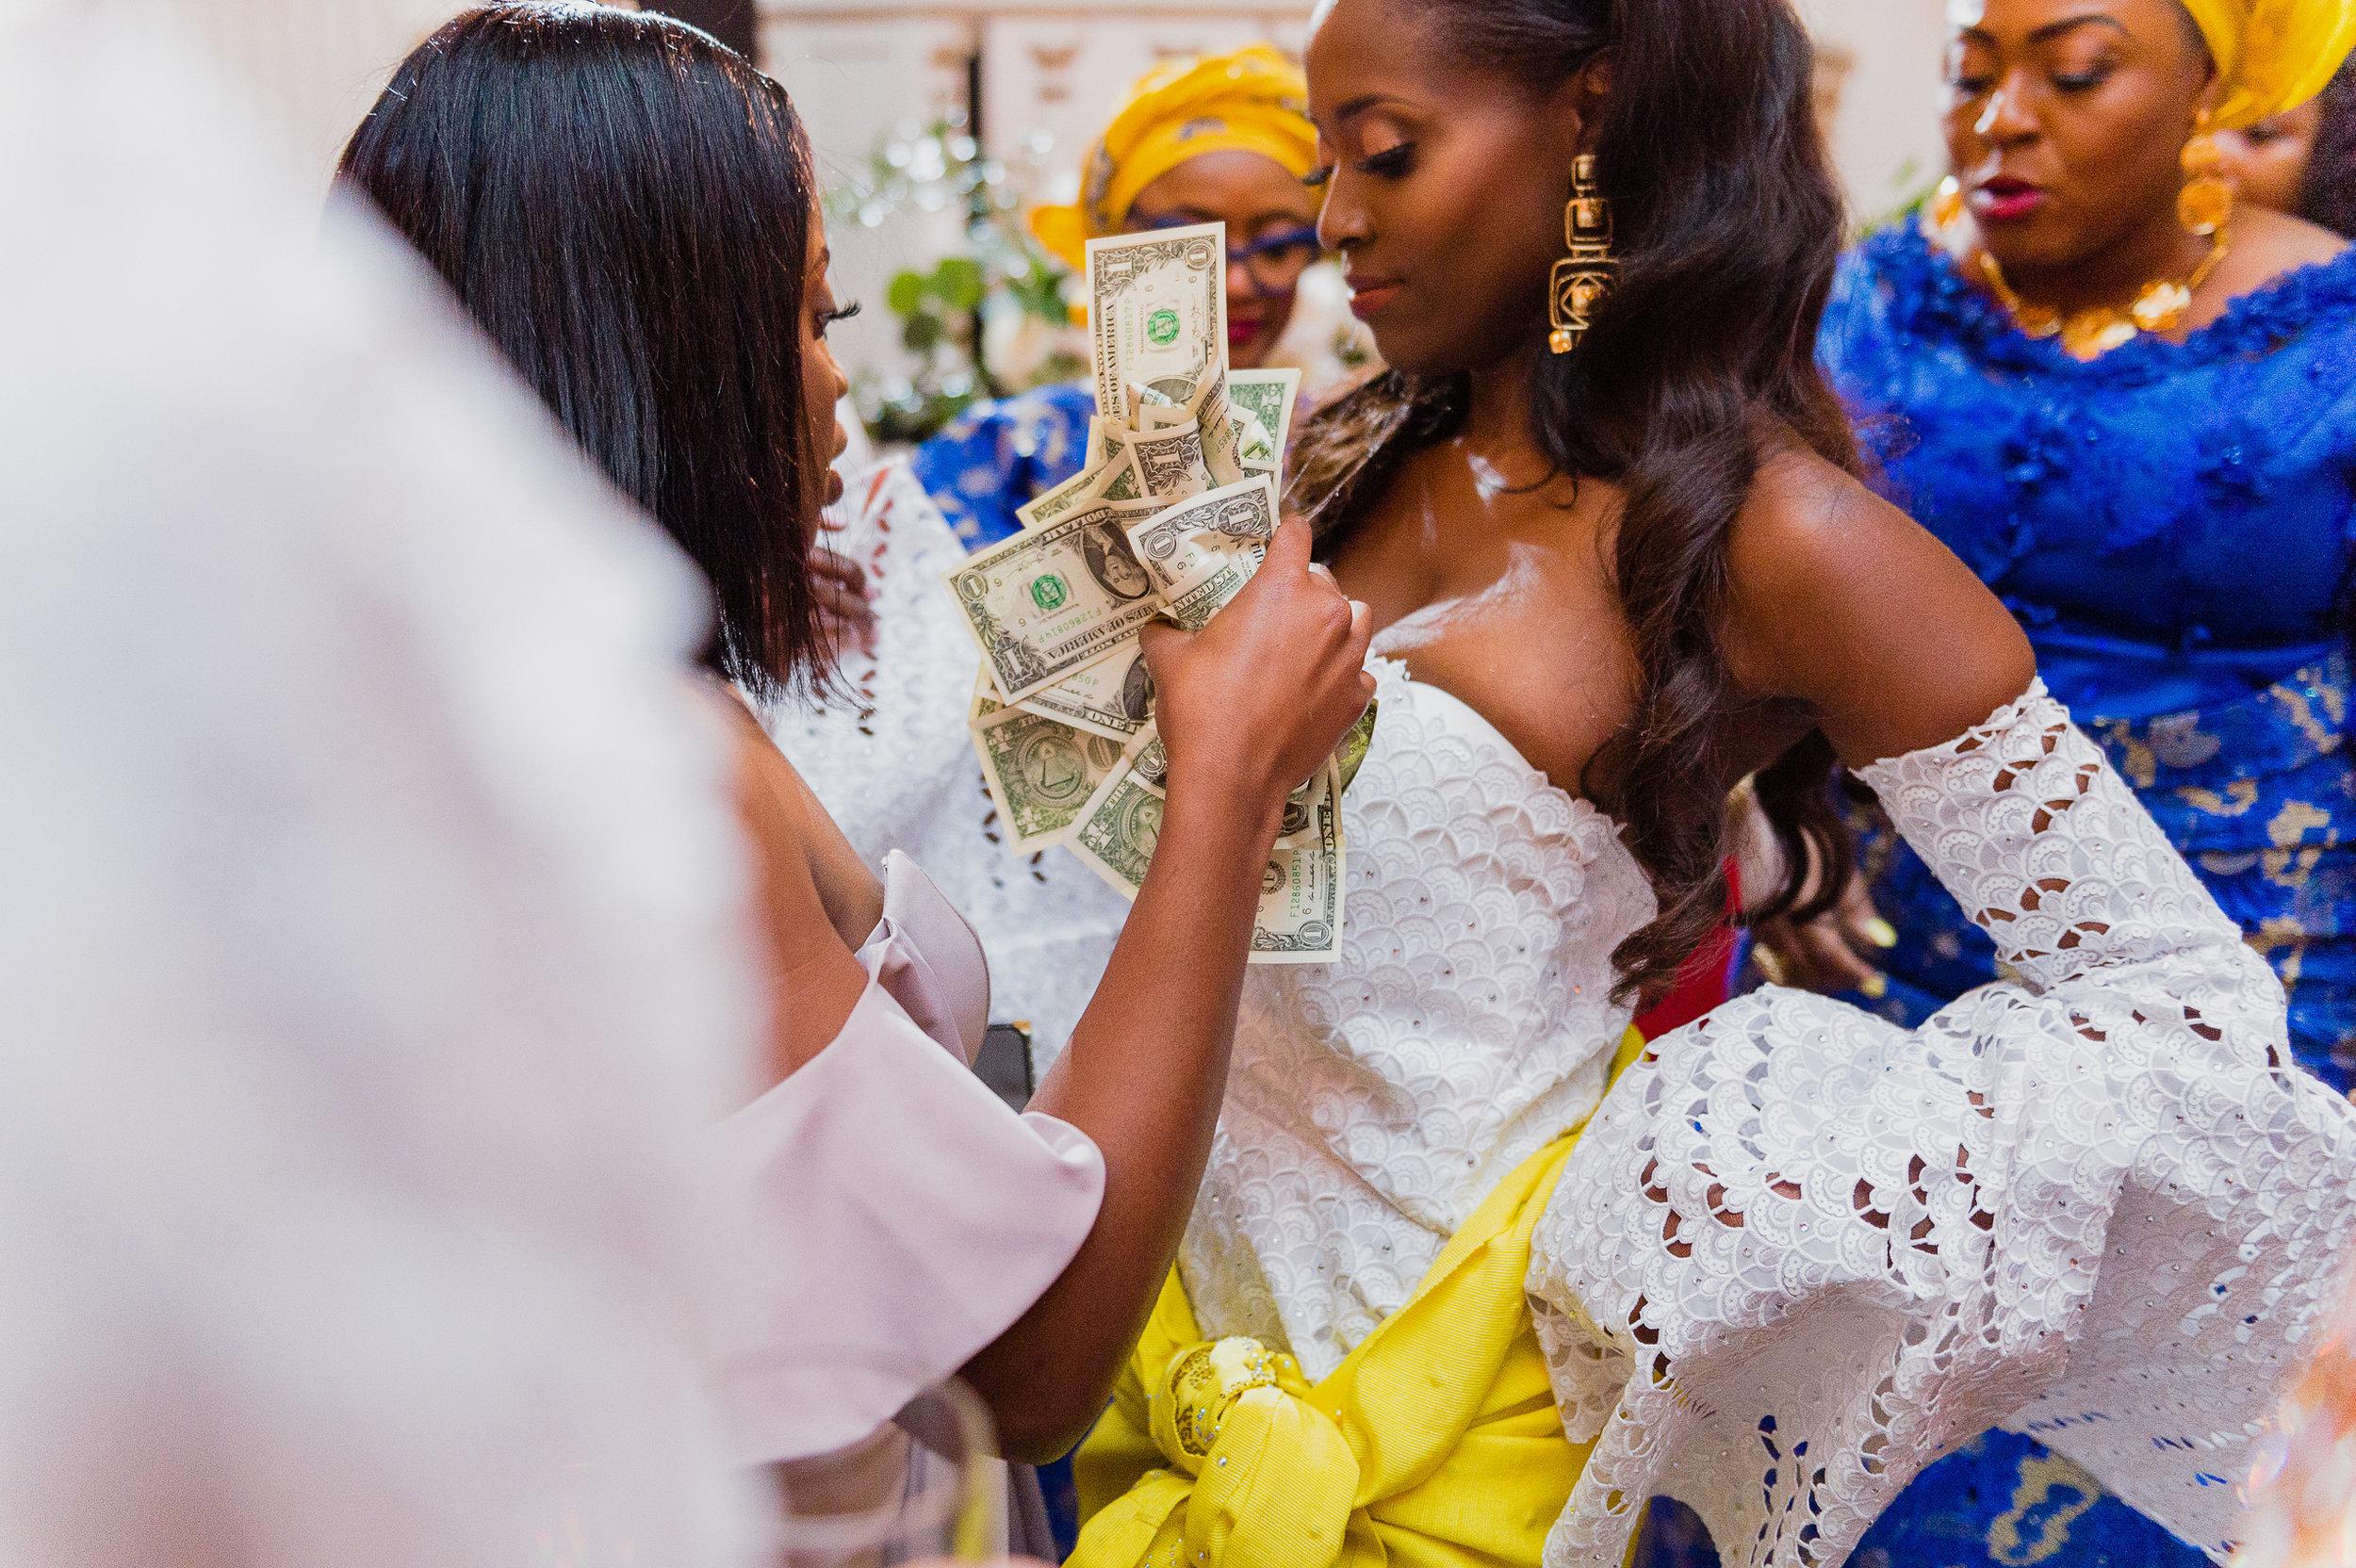 fairmont-copley-plaza-wedding-photos-00755.JPG